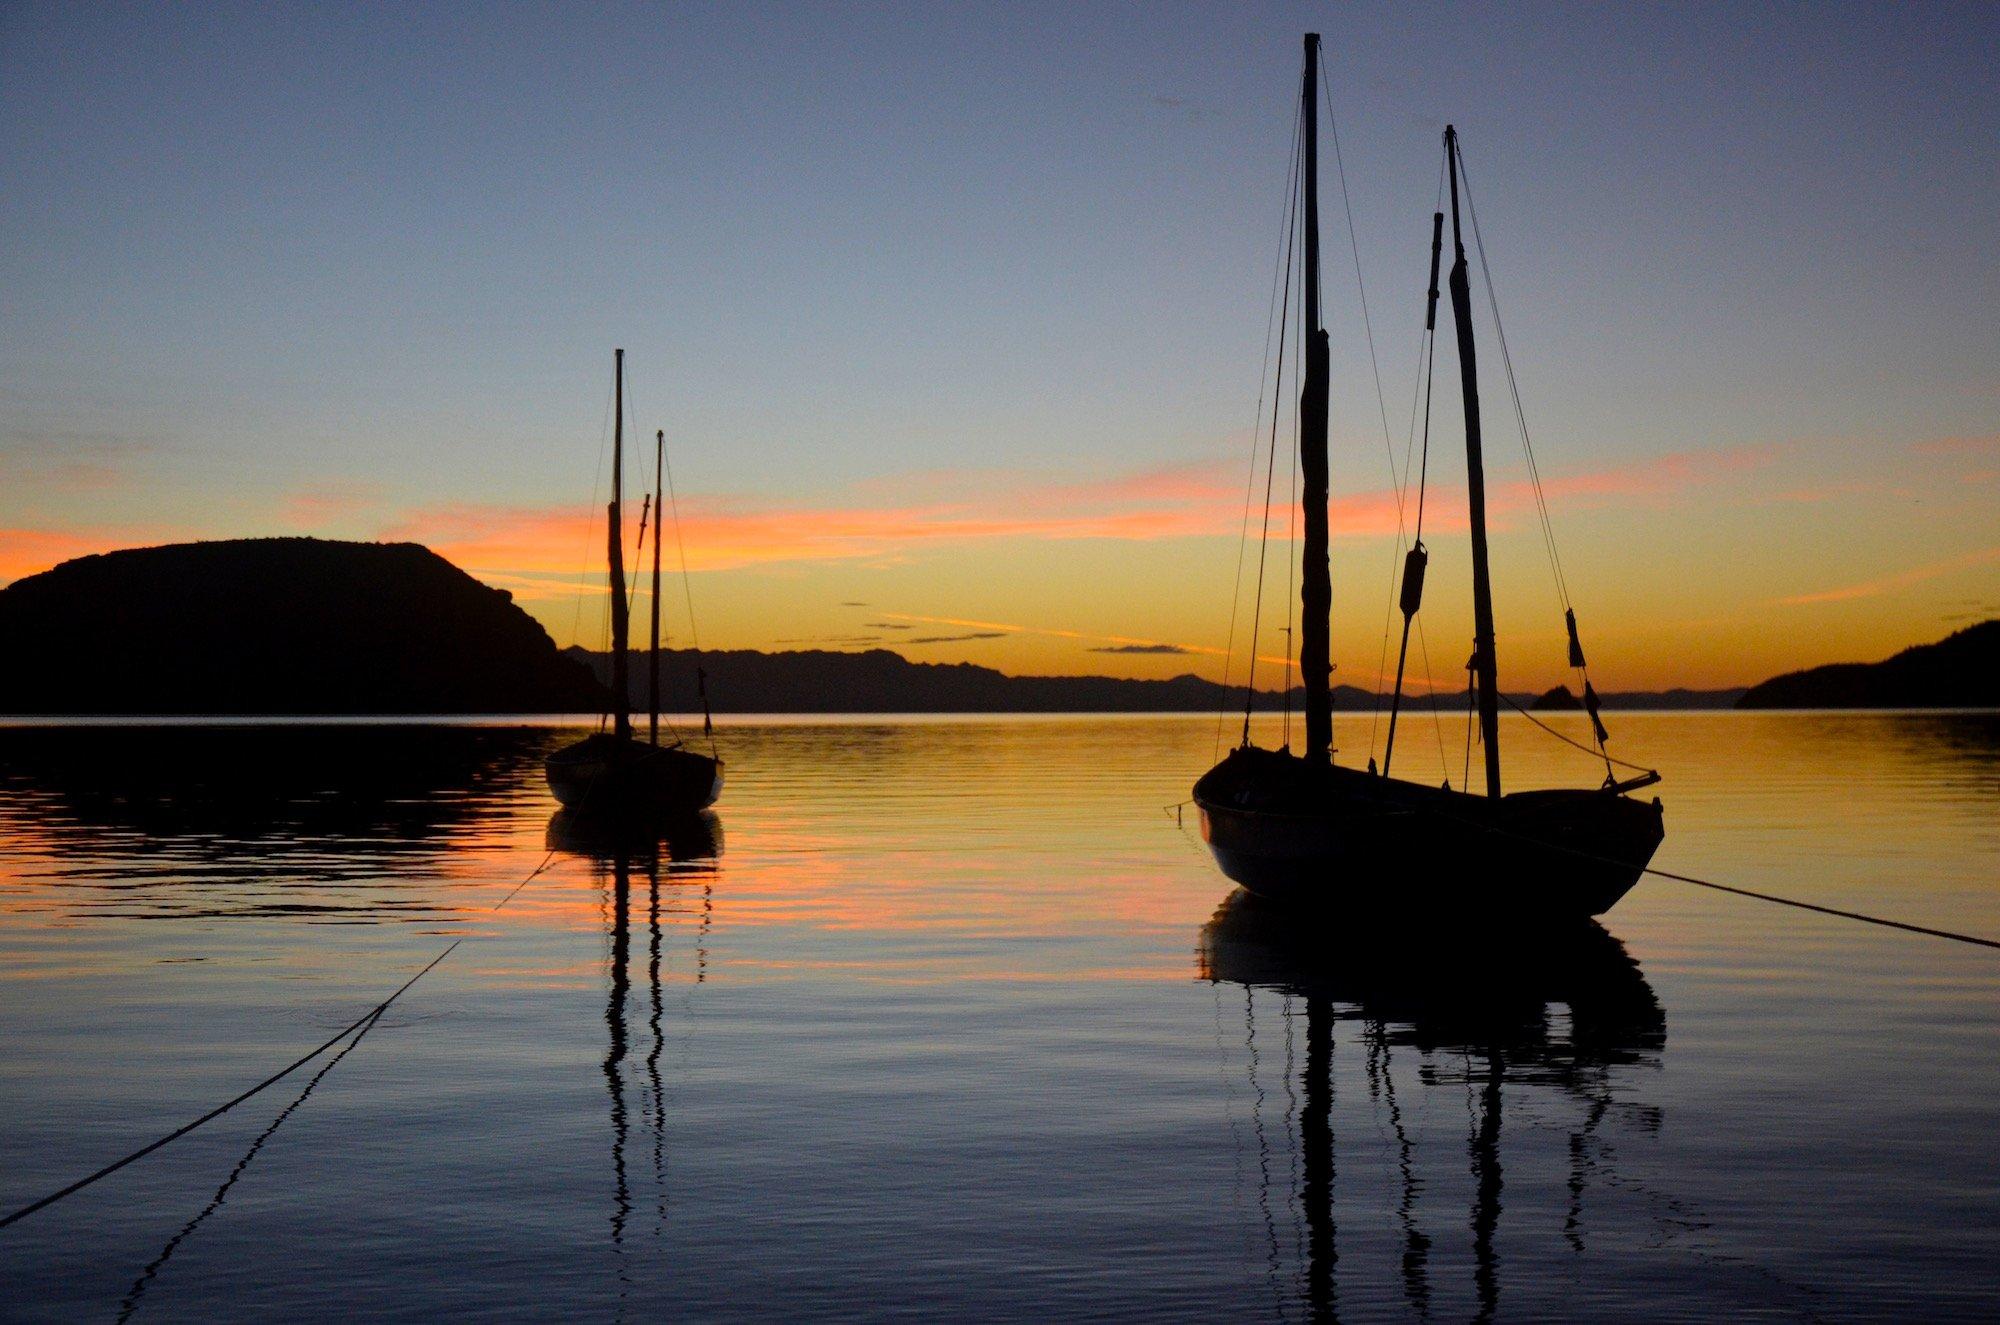 Two sailboats at sunset in Baja California